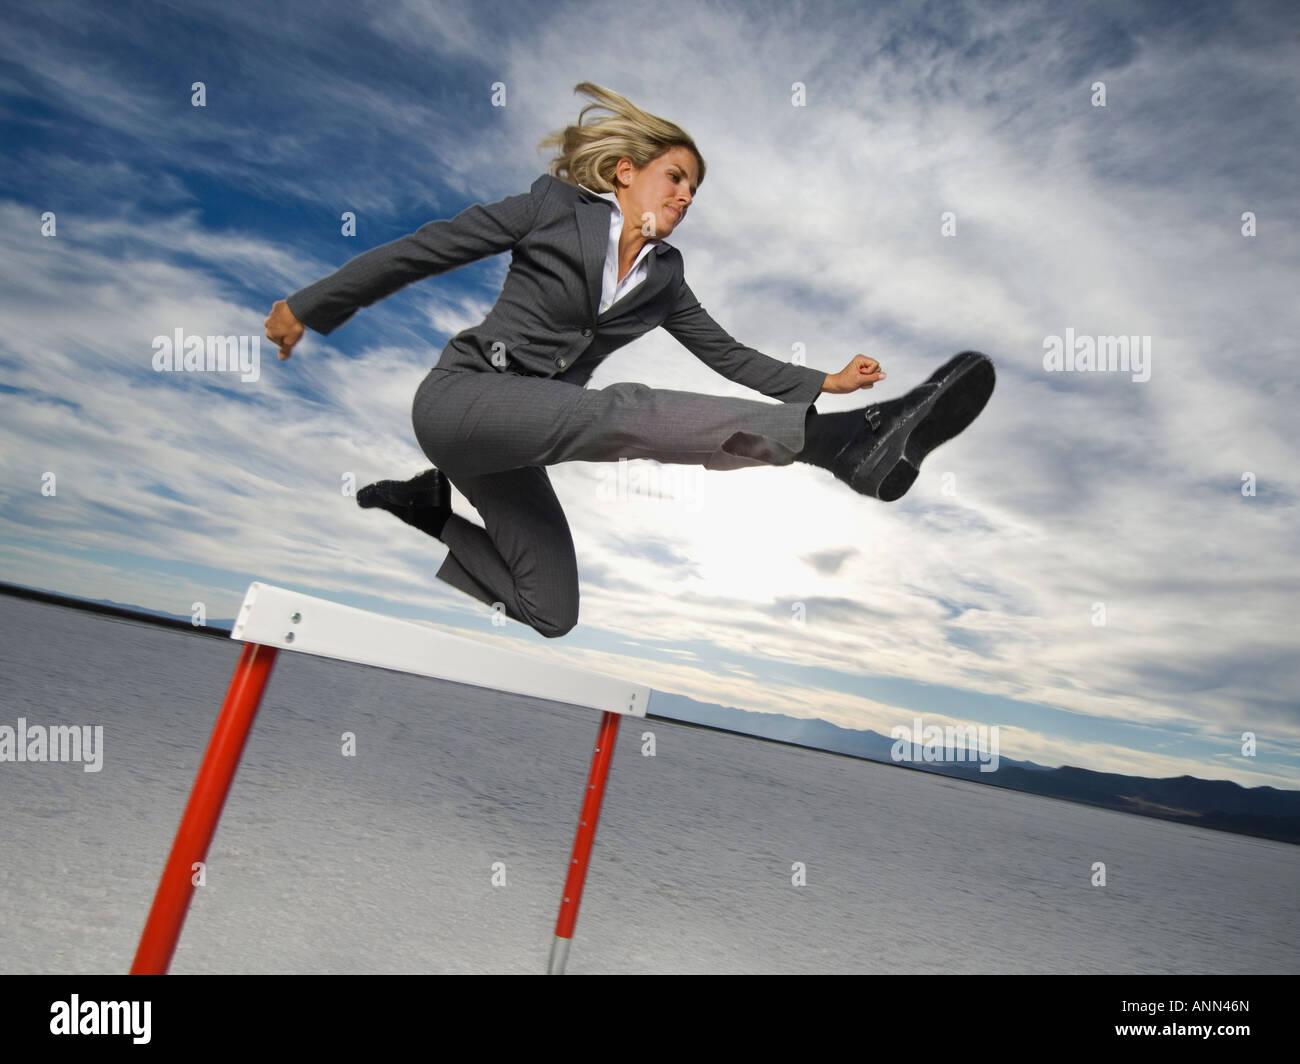 Businesswoman jumping over hurdle, Salt Flats, Utah, United States - Stock Image